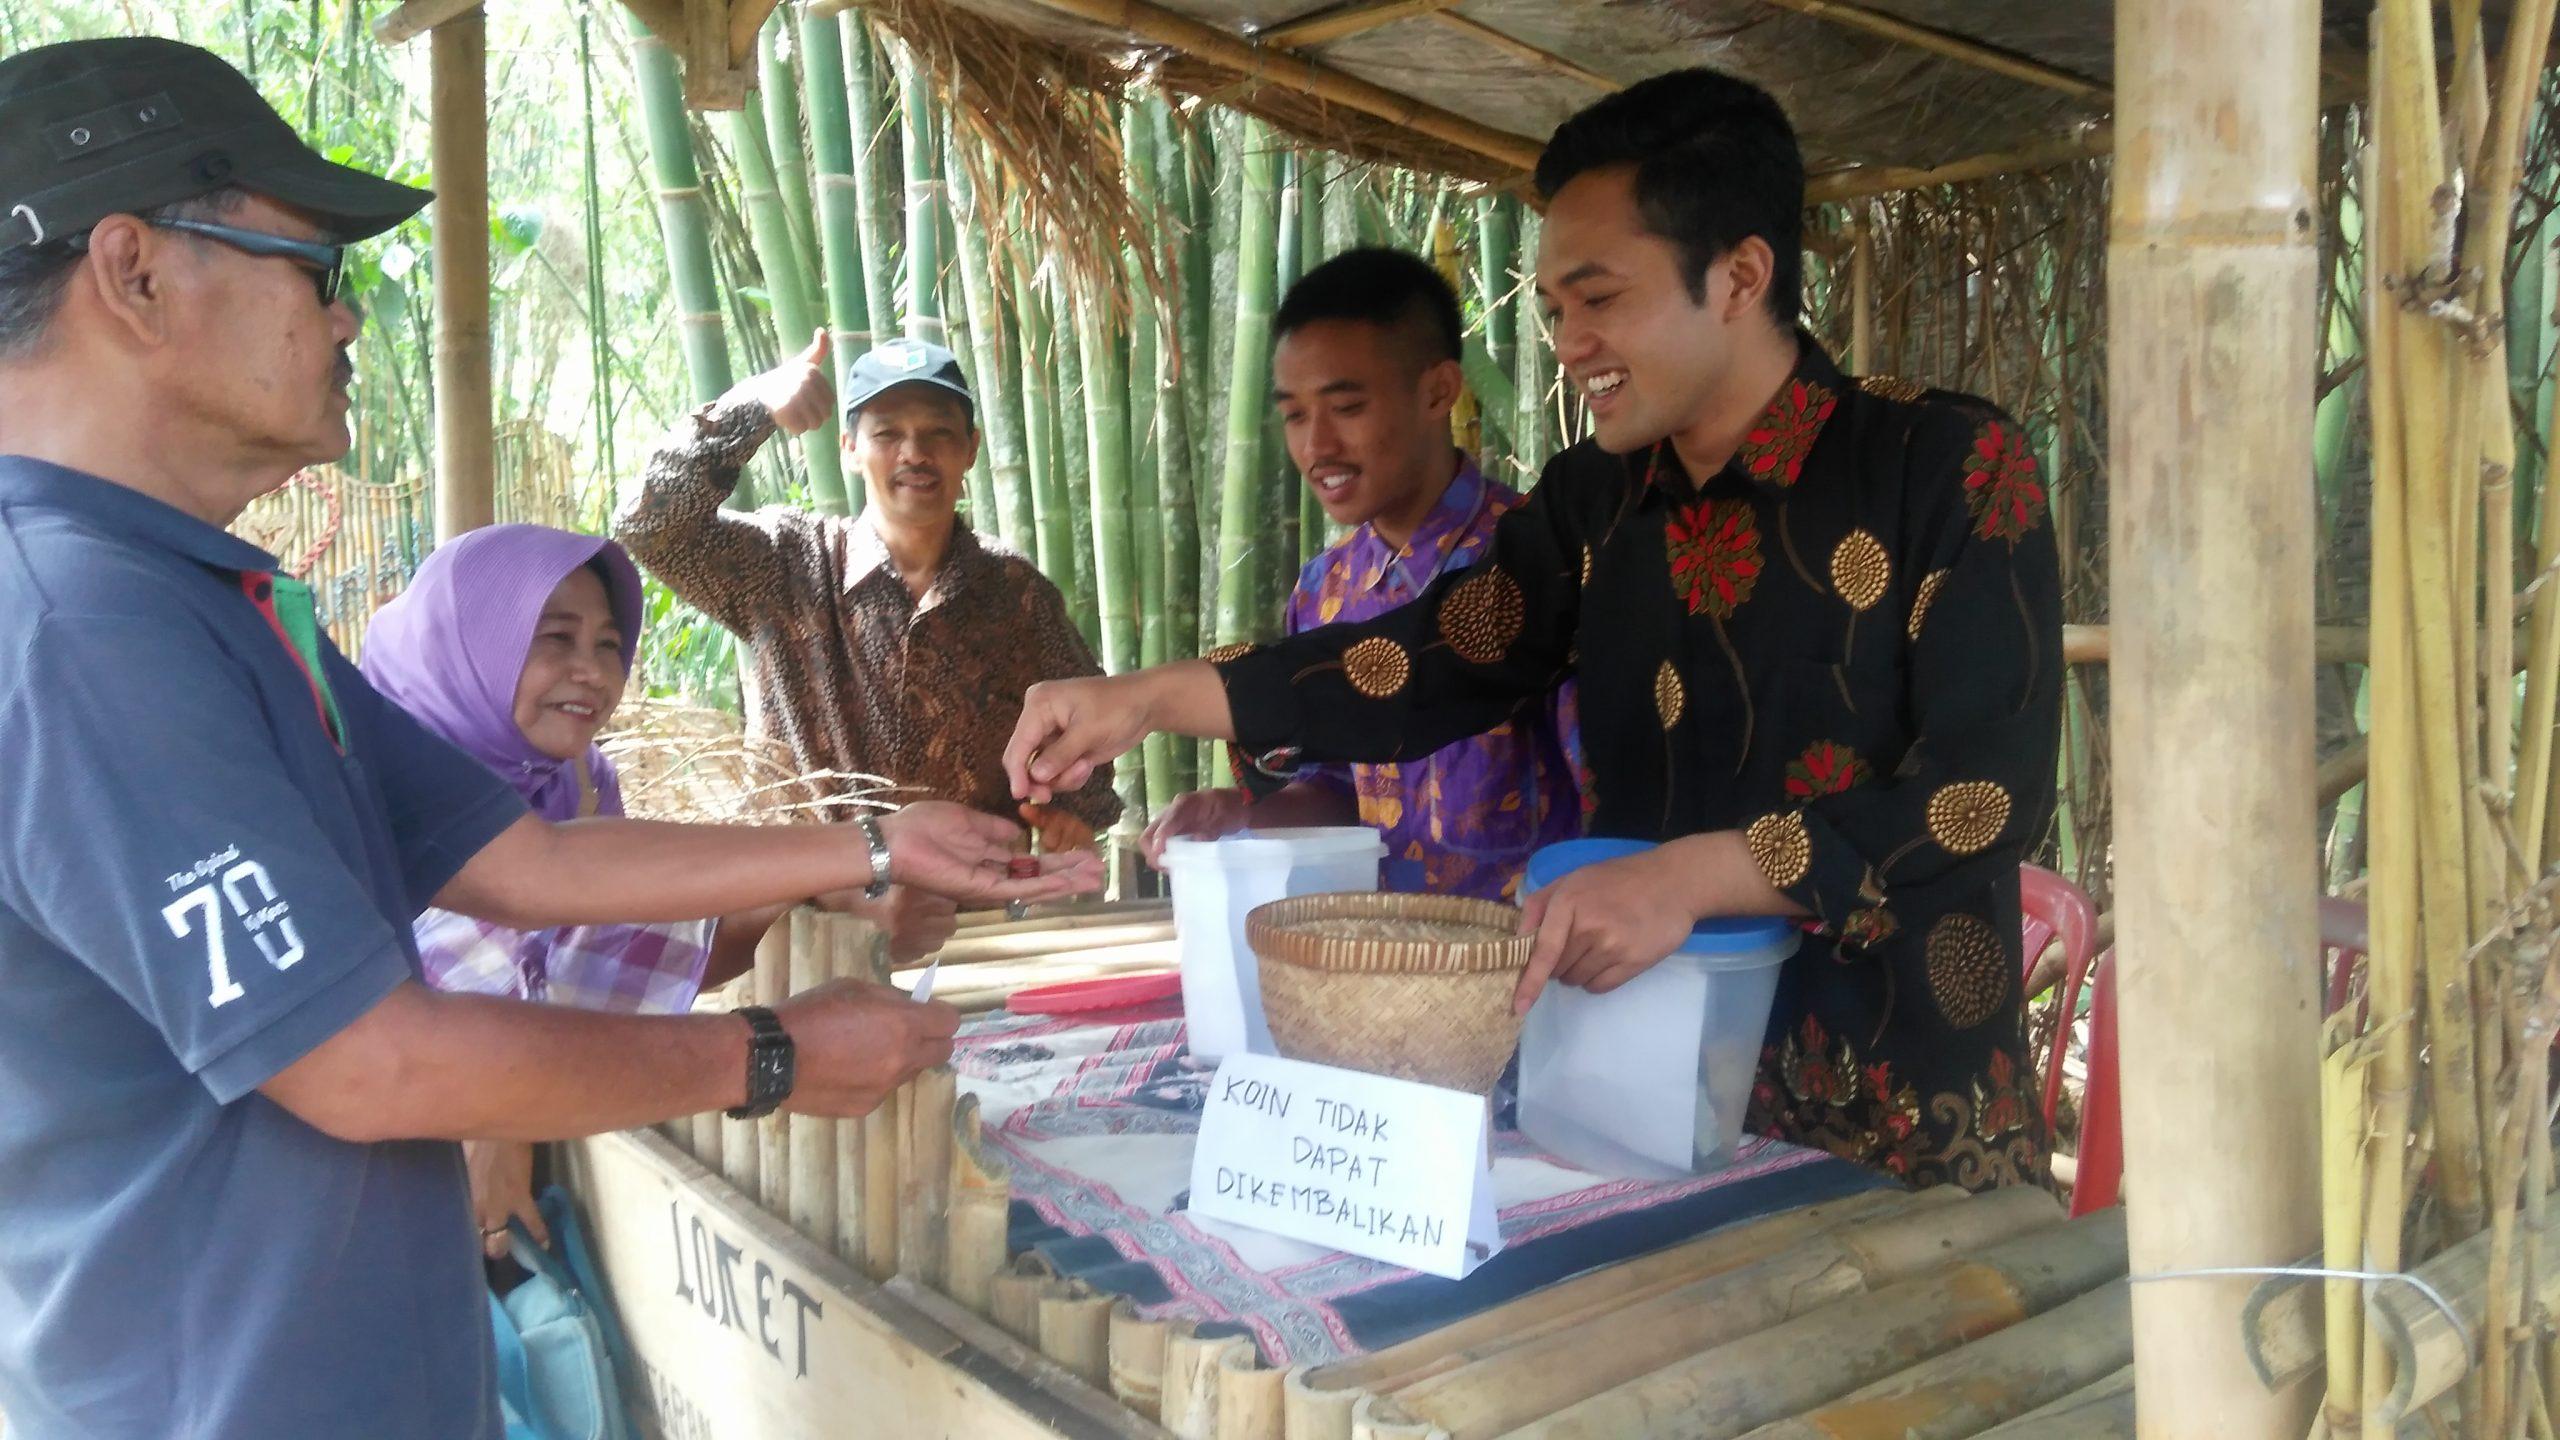 Photo of Carang Sewu, Berburu Jajanan 'Ndeso' di Tengah Rimbunnya Pohon Bambu